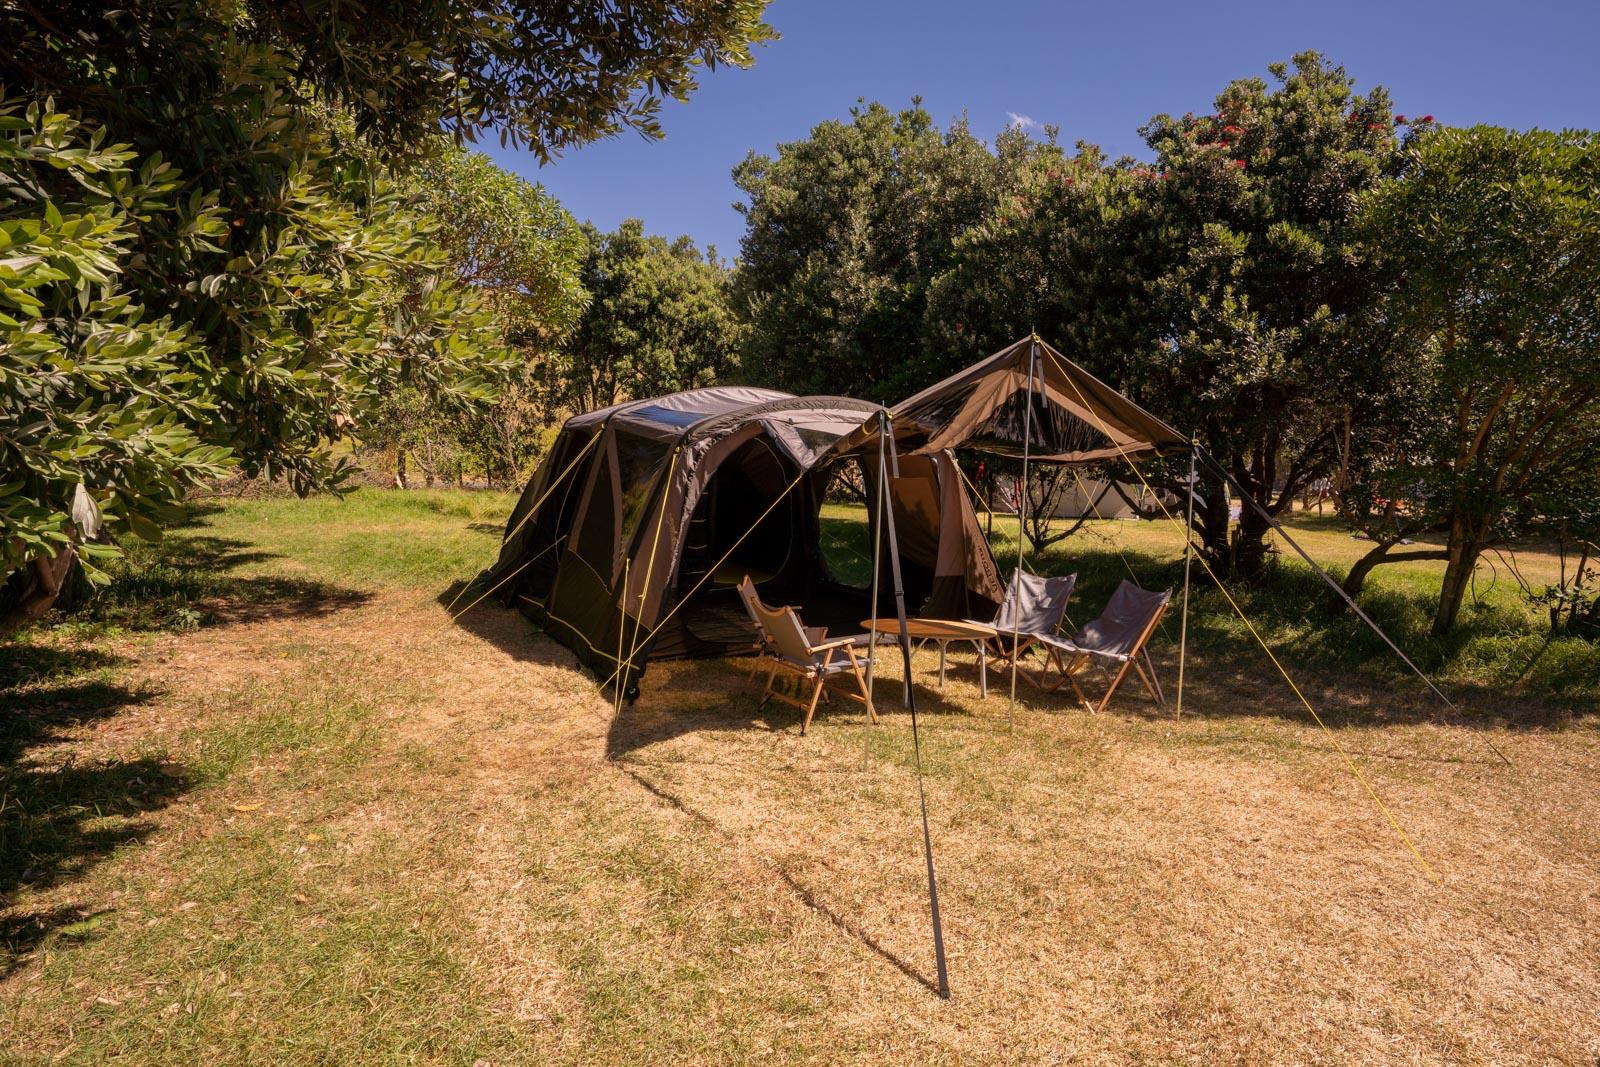 Zempire Camping Port Jackson